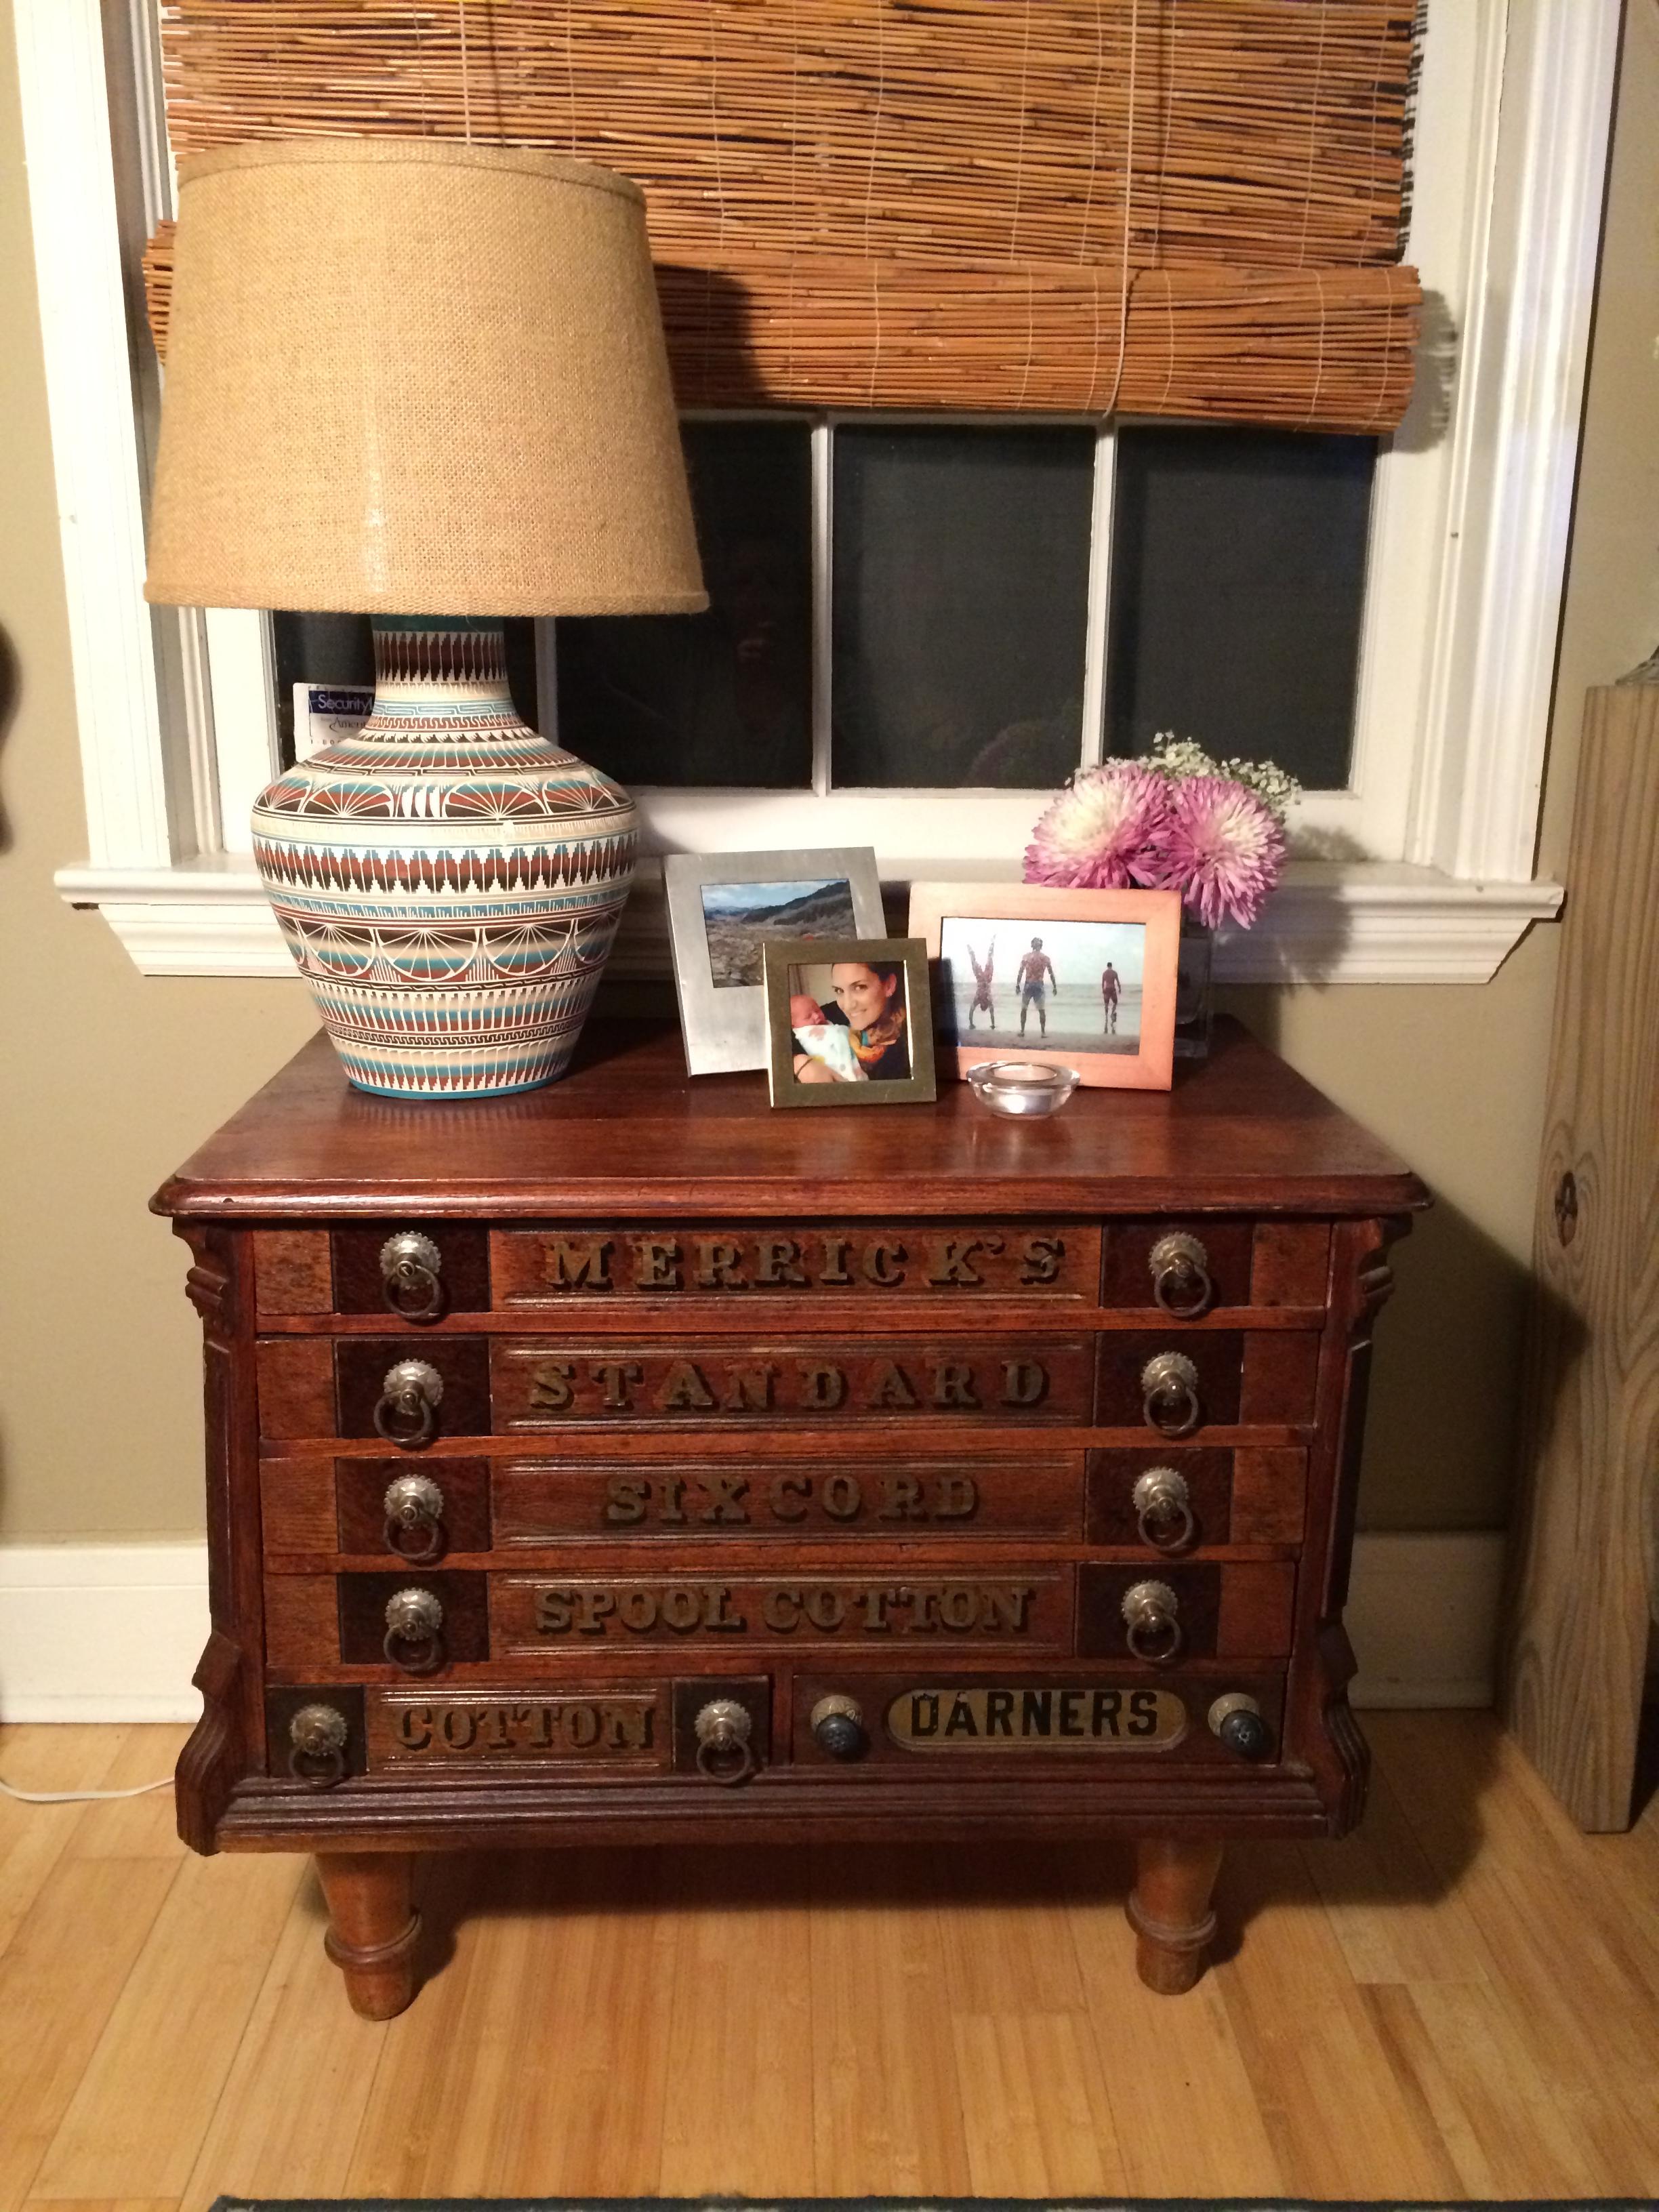 Merrick's Spool Cabinet Revival